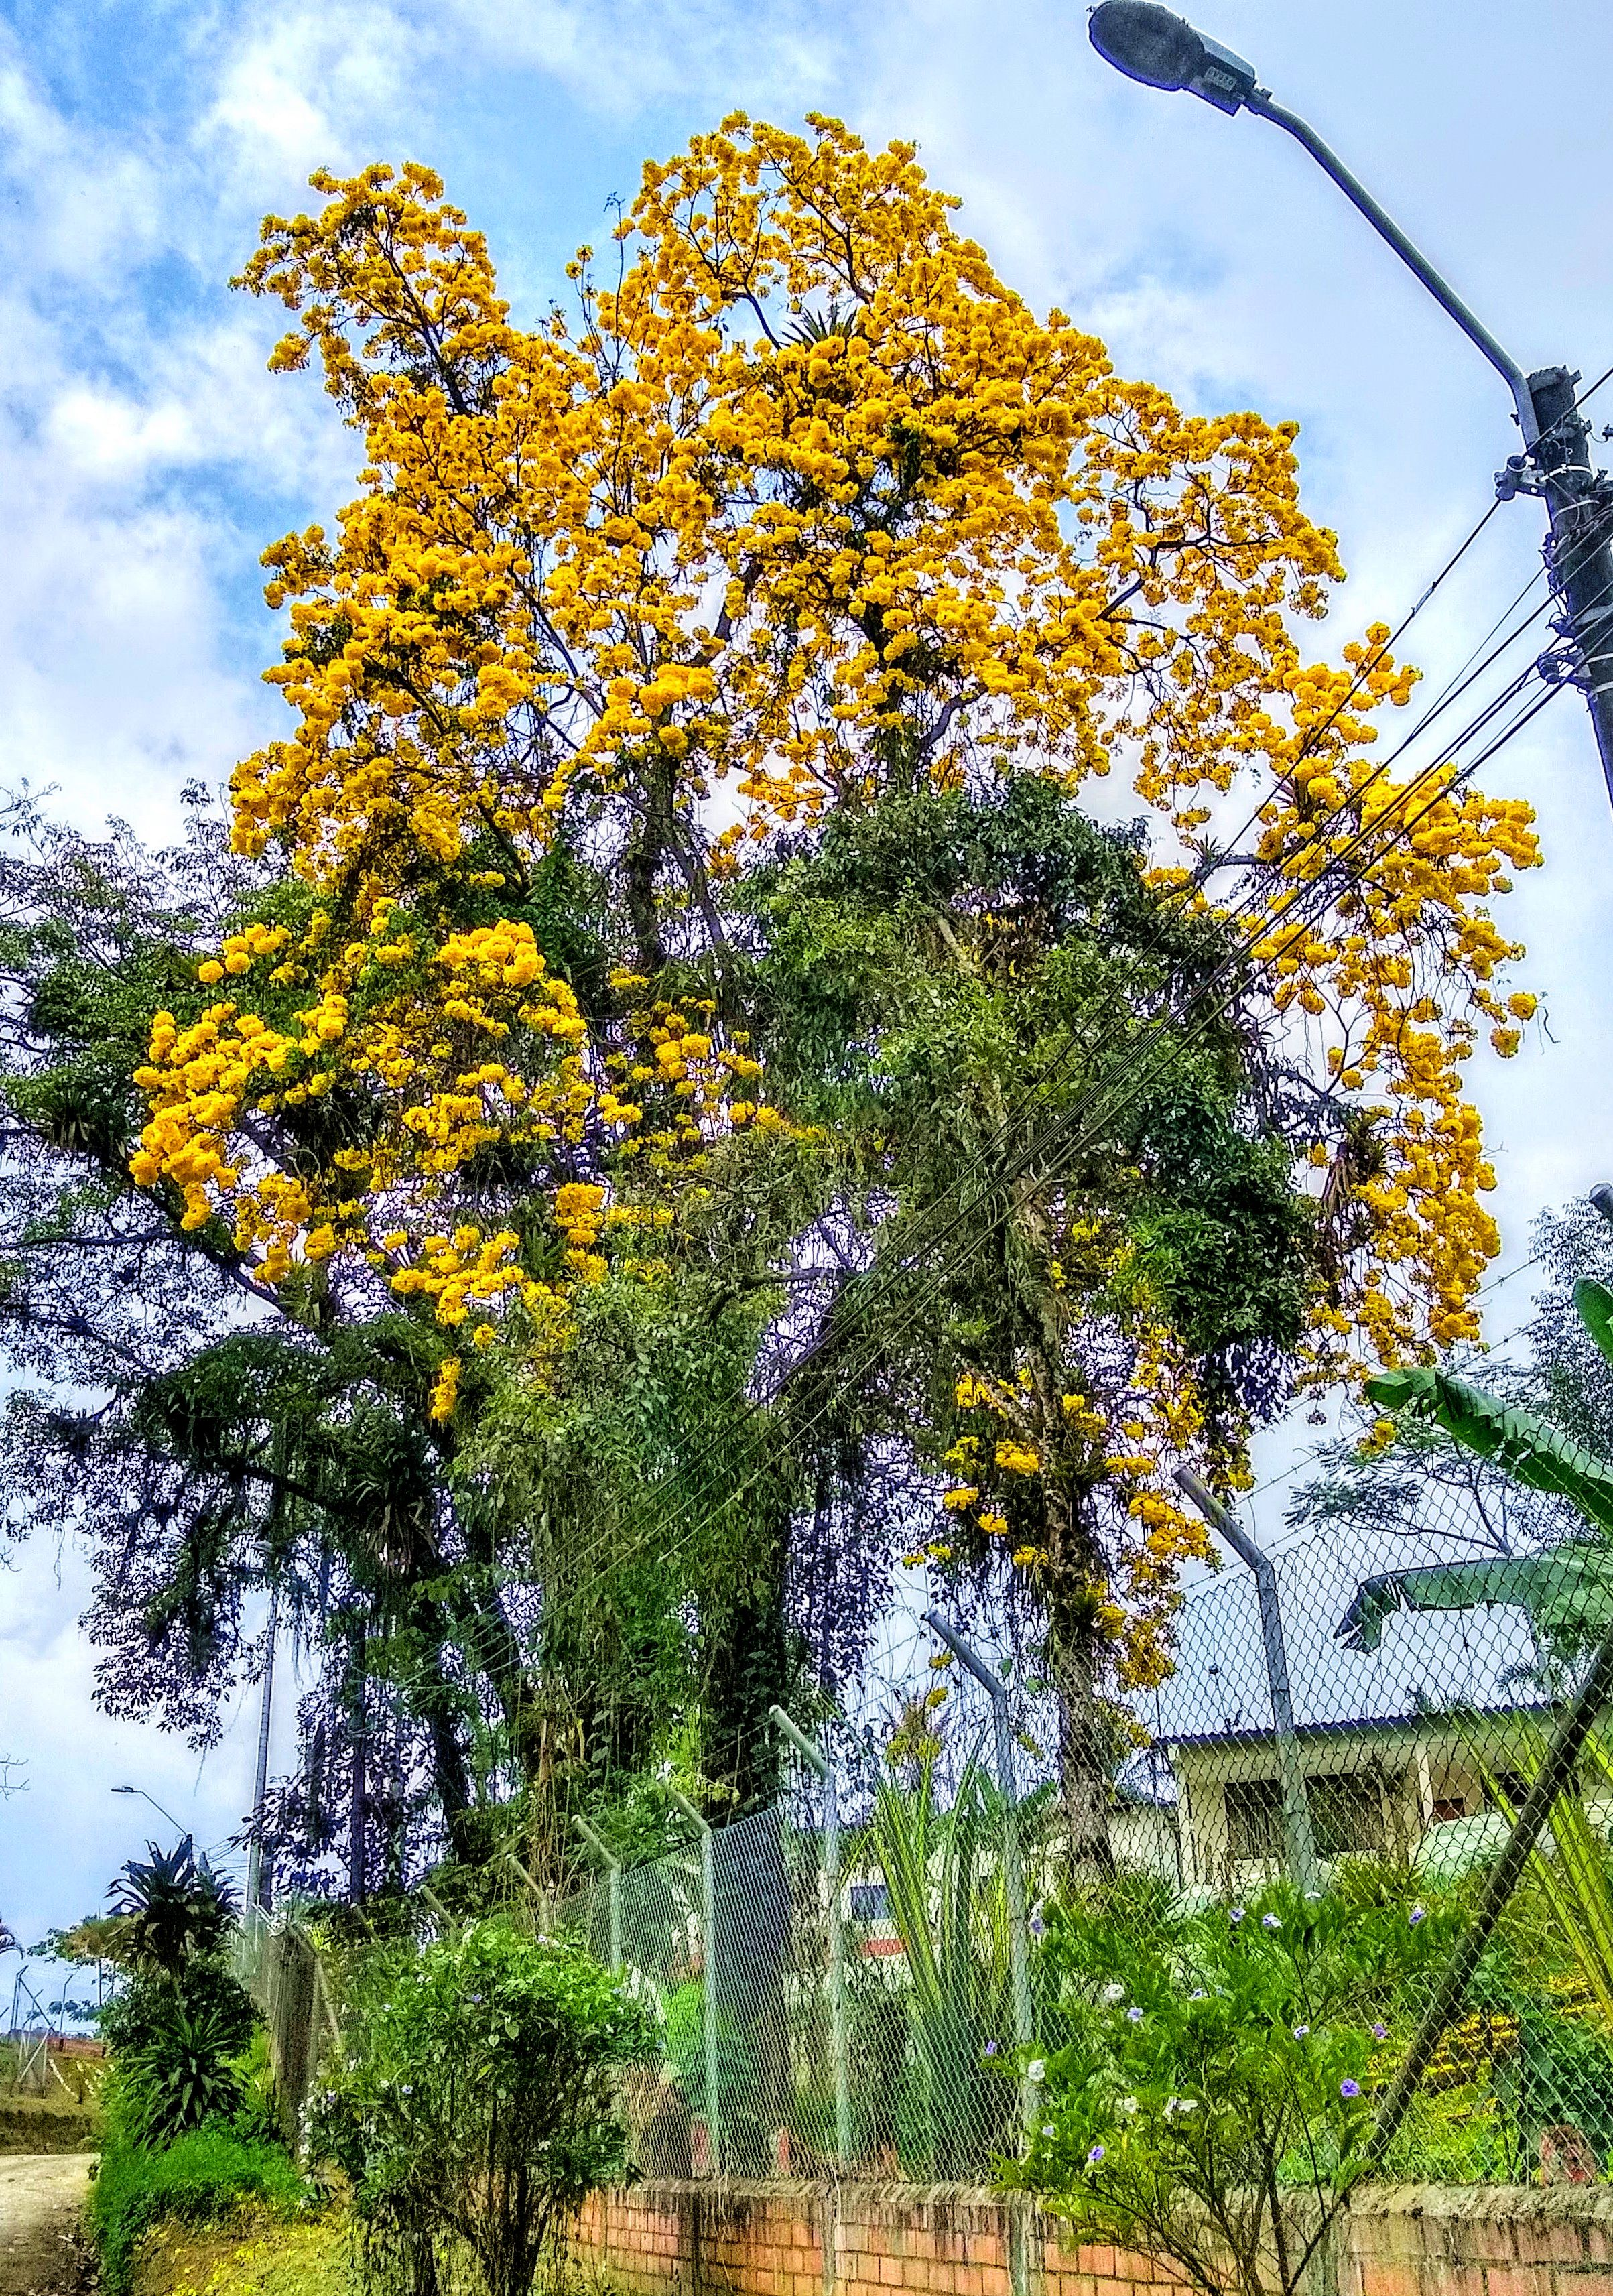 Santa Rosa de Cabal, Tabebuia tree